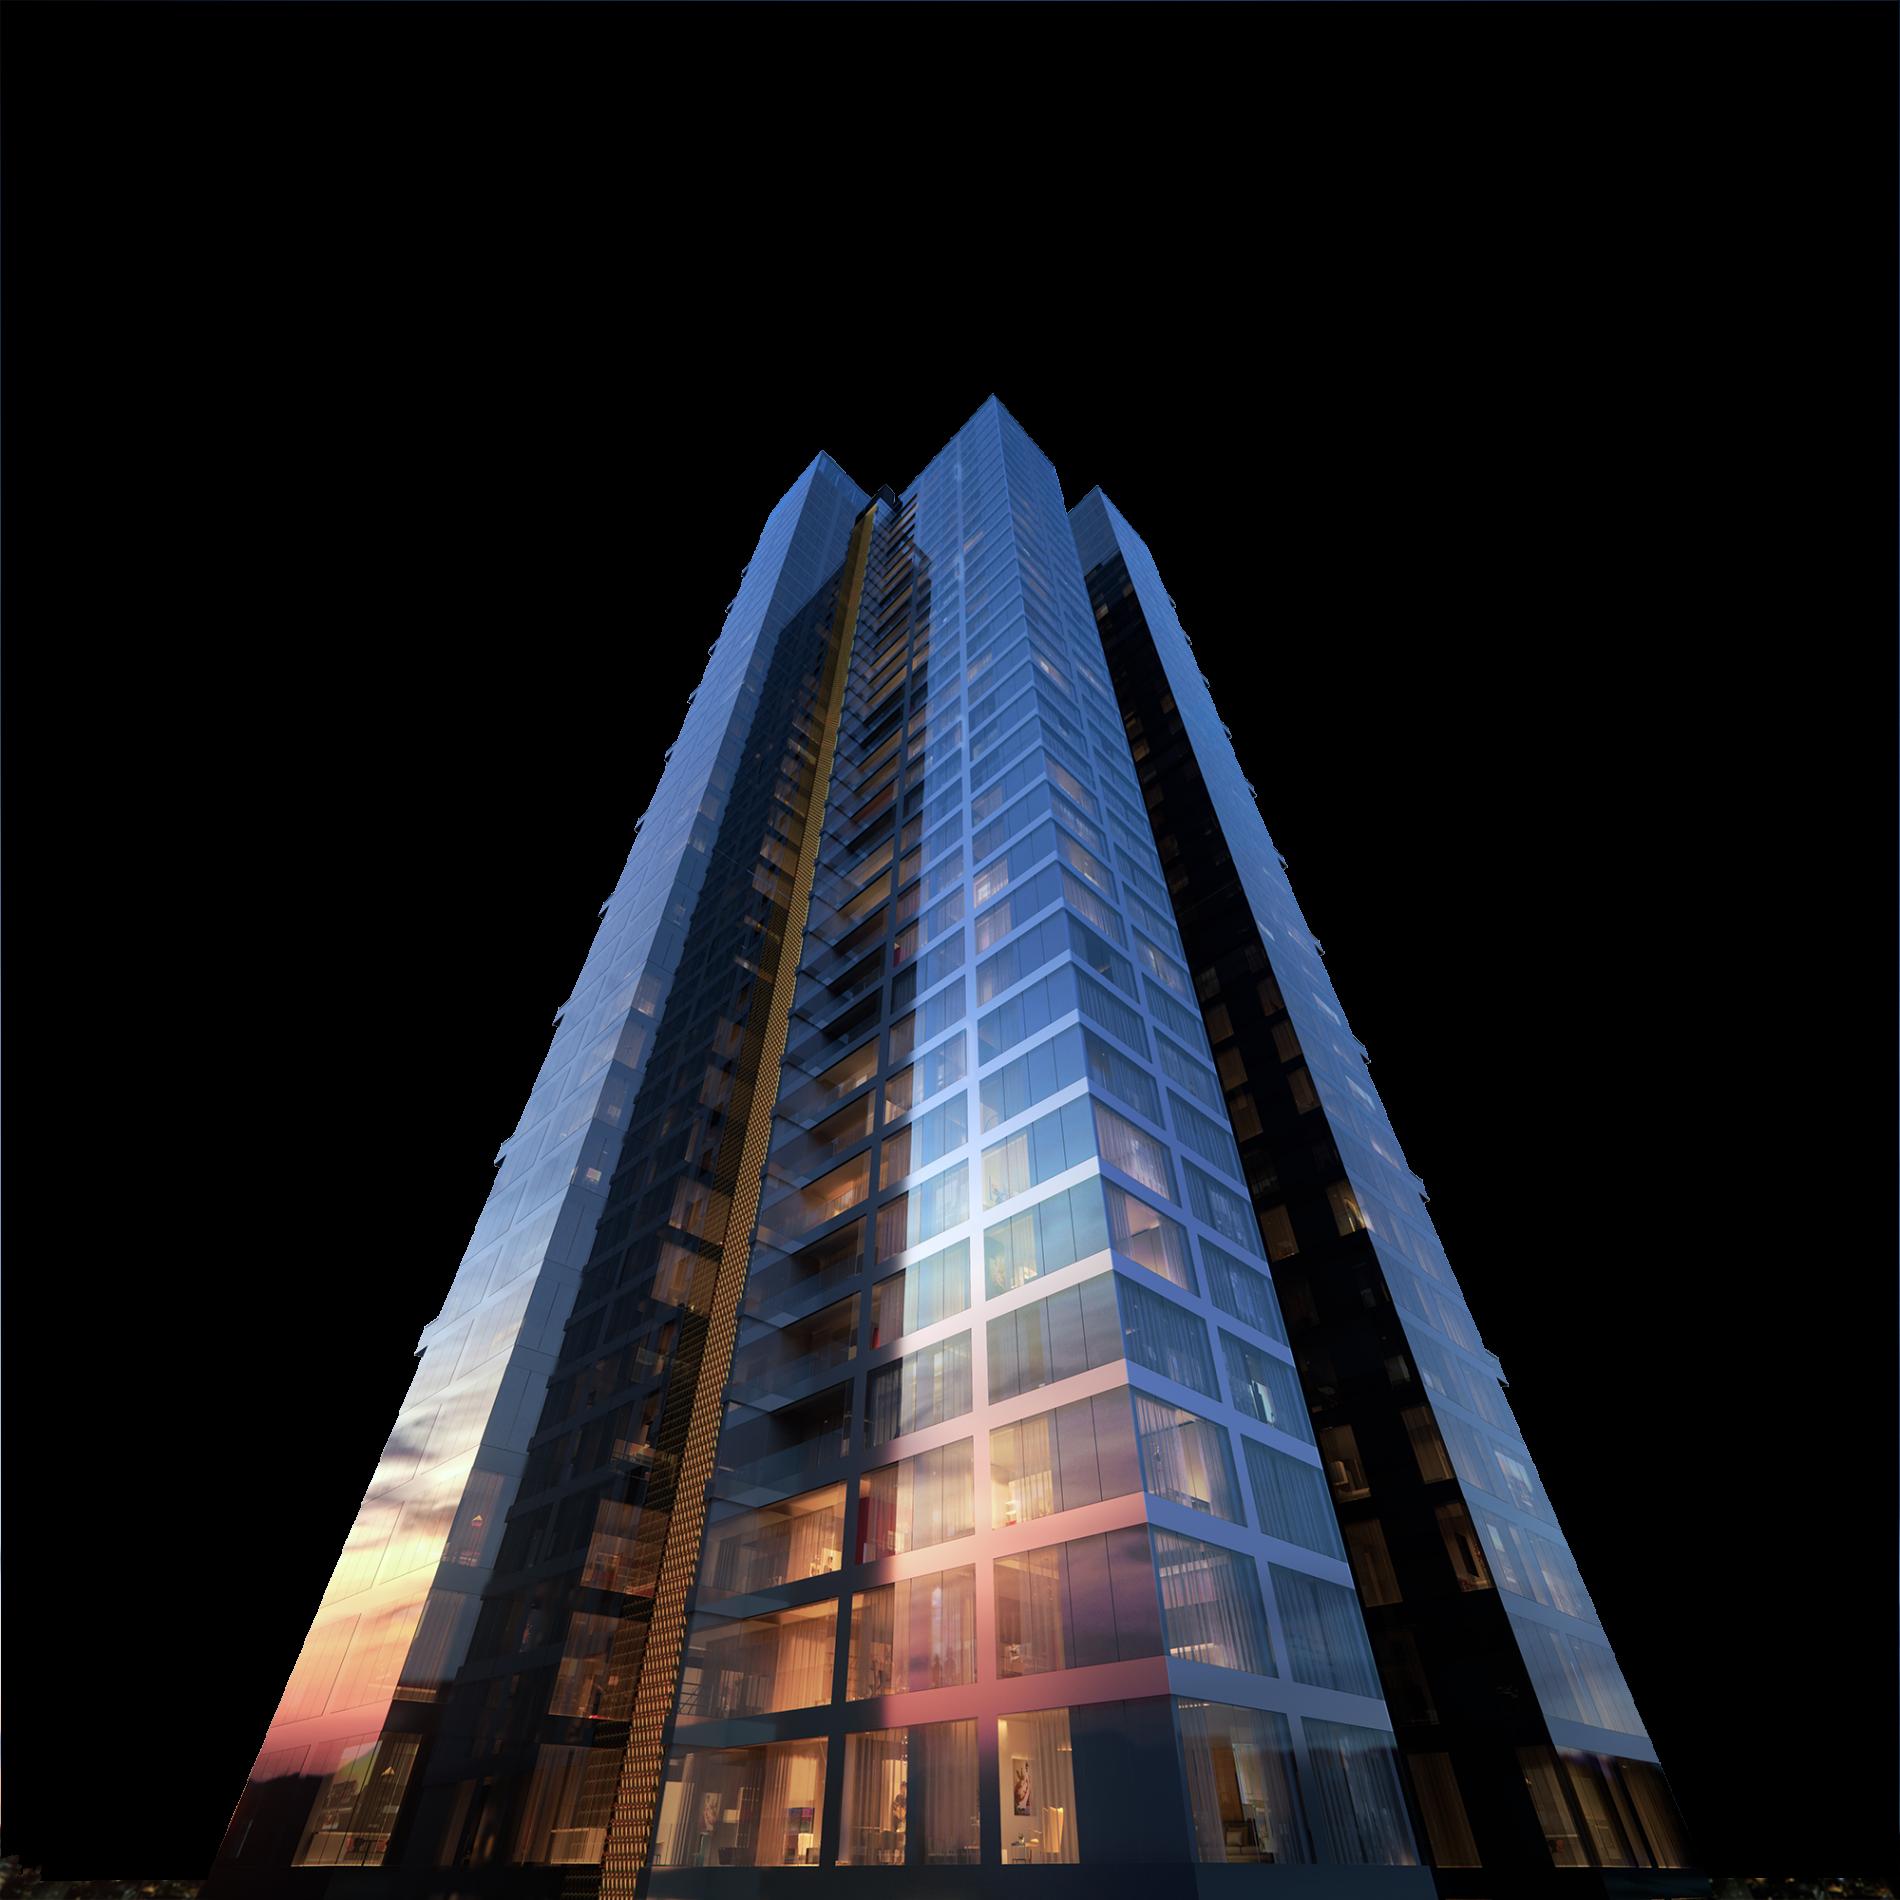 Kolkata Trump Tower, Luxury property in Kolkata, Affordable housing in Kolkata, Kolkata property market, Kolkata real estate, Forum Atmosphere, The 42 at Chowringhee, Luxury life of Kolkata, NRIs in Kolkata, HNIs in Kolkata, Investment in Kolkata, Night life in Kolkata